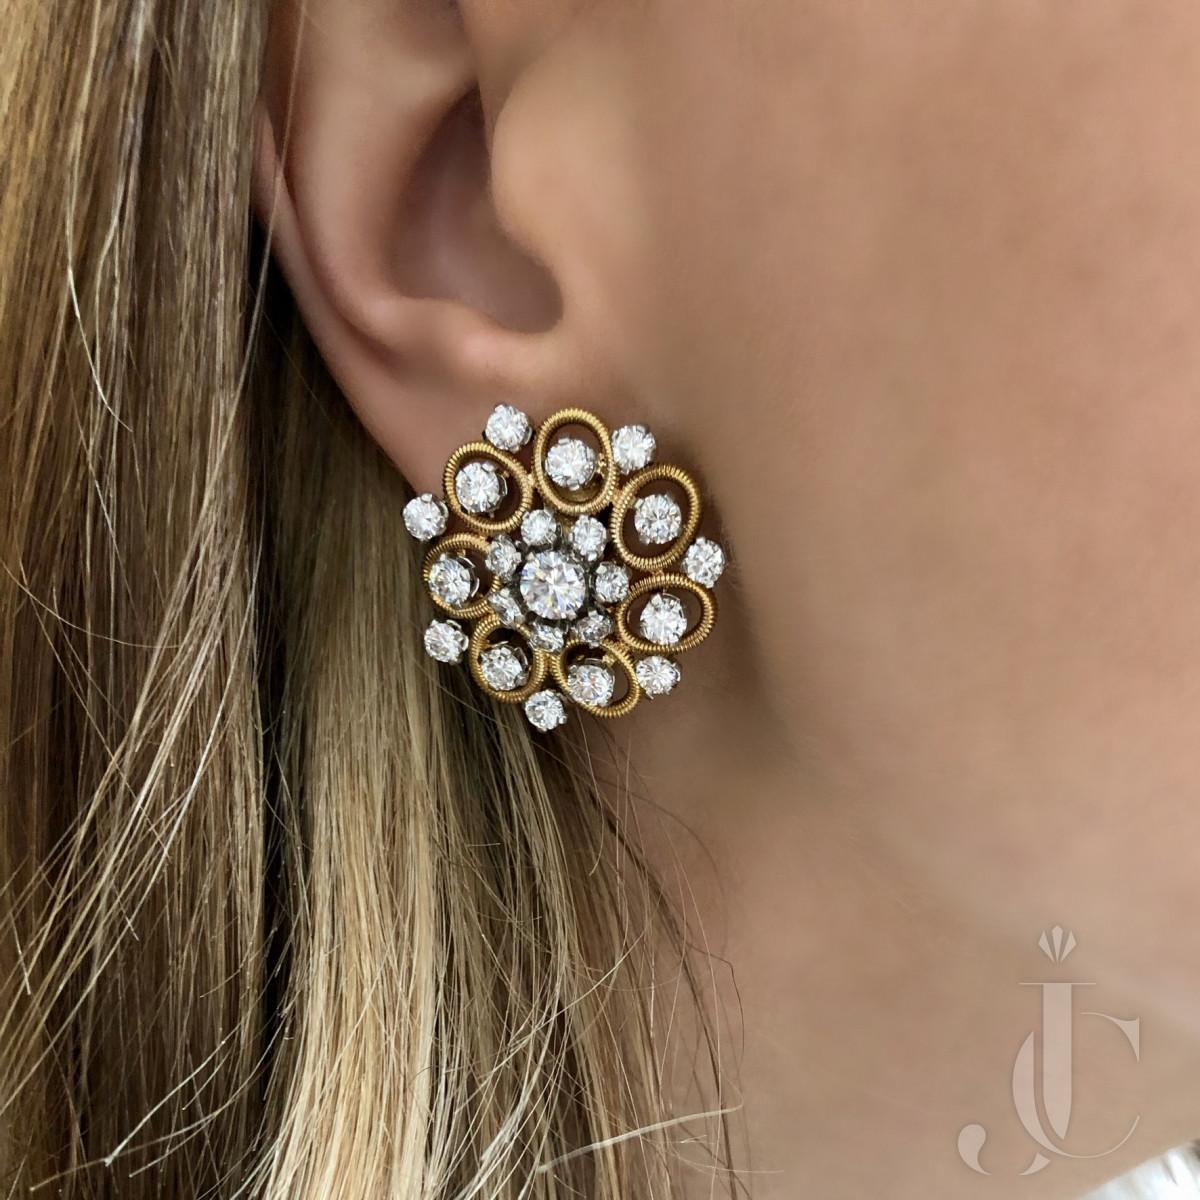 18kt Yellow Gold and Platinum Diamond Earrings, circa 1965